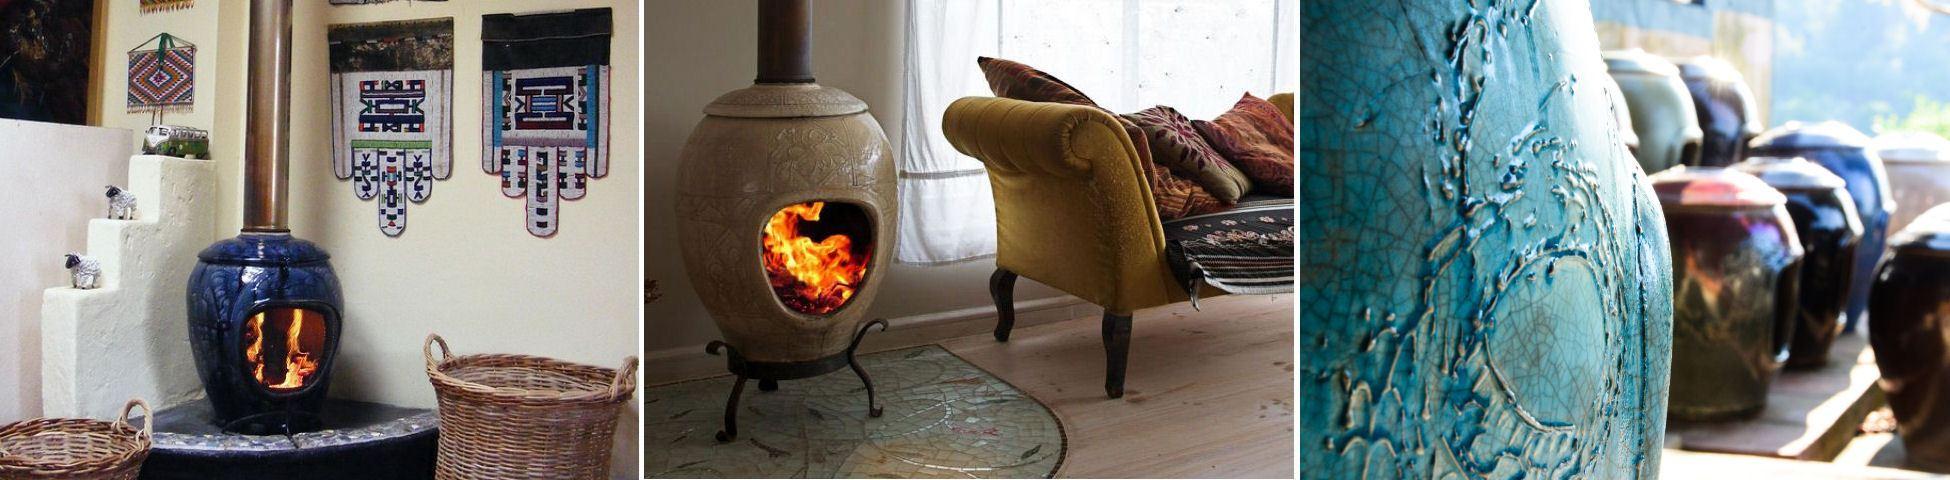 Hot Art | Free standing ceramic fireplaces & firepots